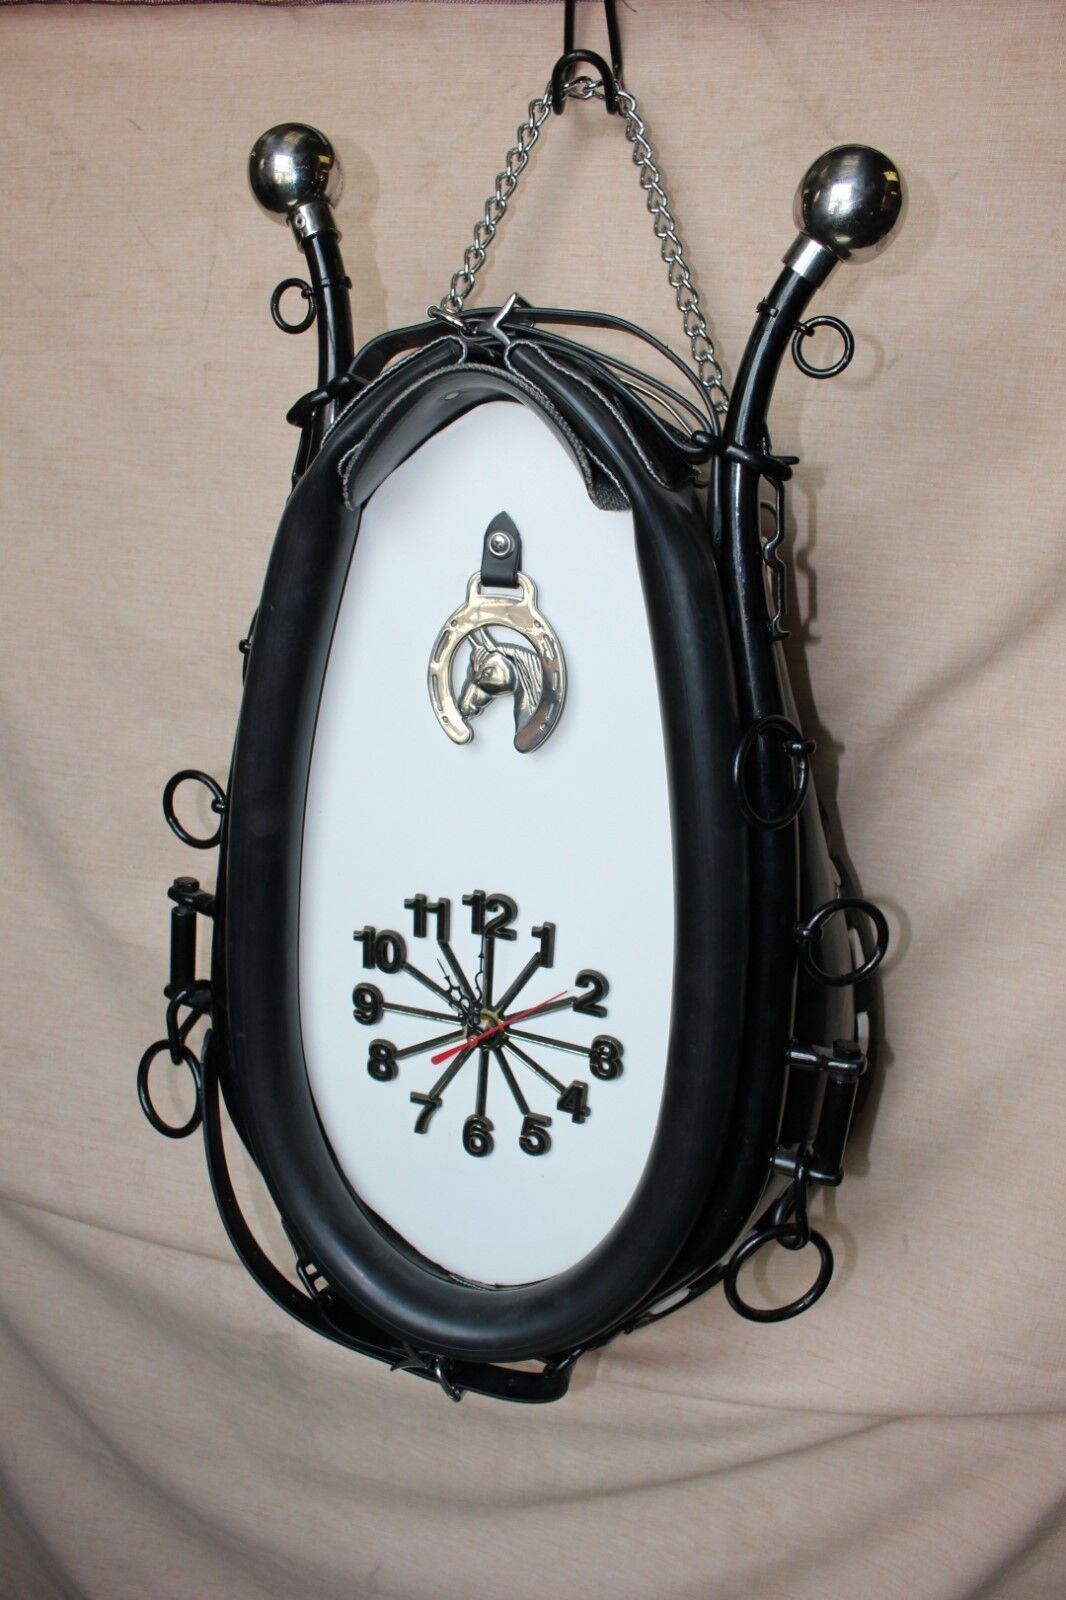 35-21 Nuevo Reloj Collar de caballo de tiro con fondo blancoo Hames